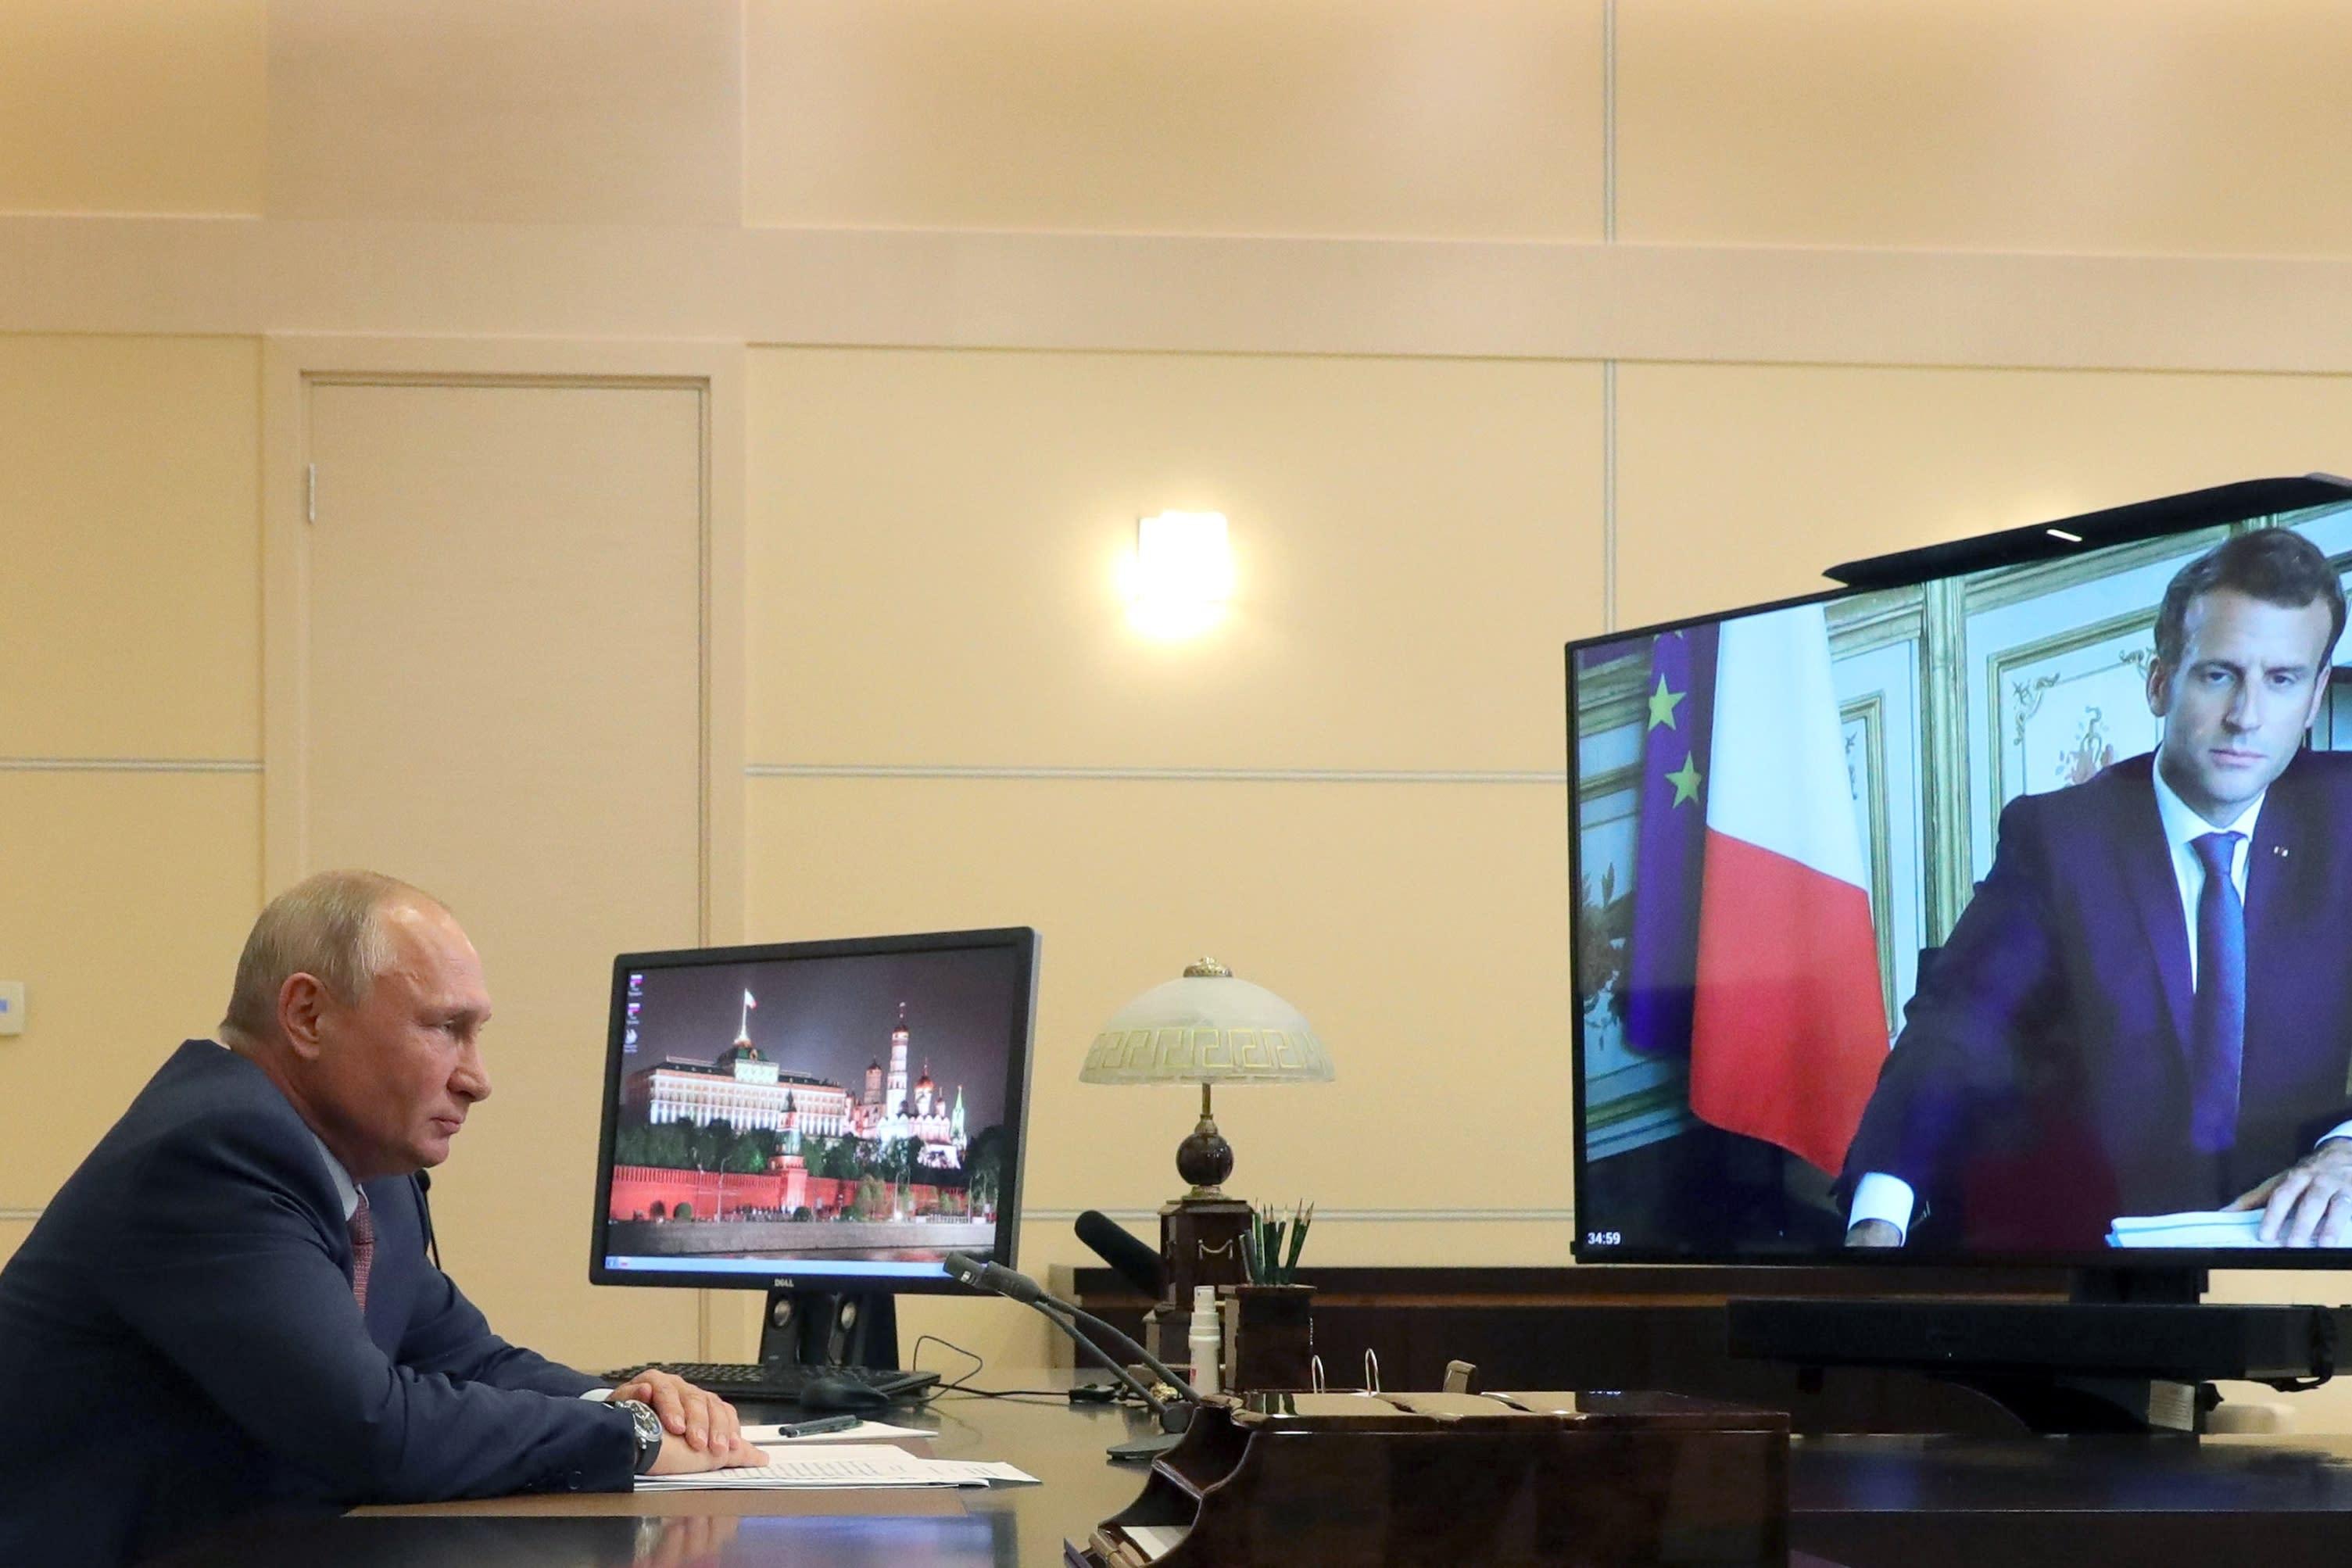 Russian President Vladimir Putin listens to French President Emmanuel Macron during a via video conference at the Novo-Ogaryovo residence outside Moscow, Russia, Friday, June 26, 2020. (Mikhail Klimentyev, Sputnik, Kremlin Pool Photo via AP)